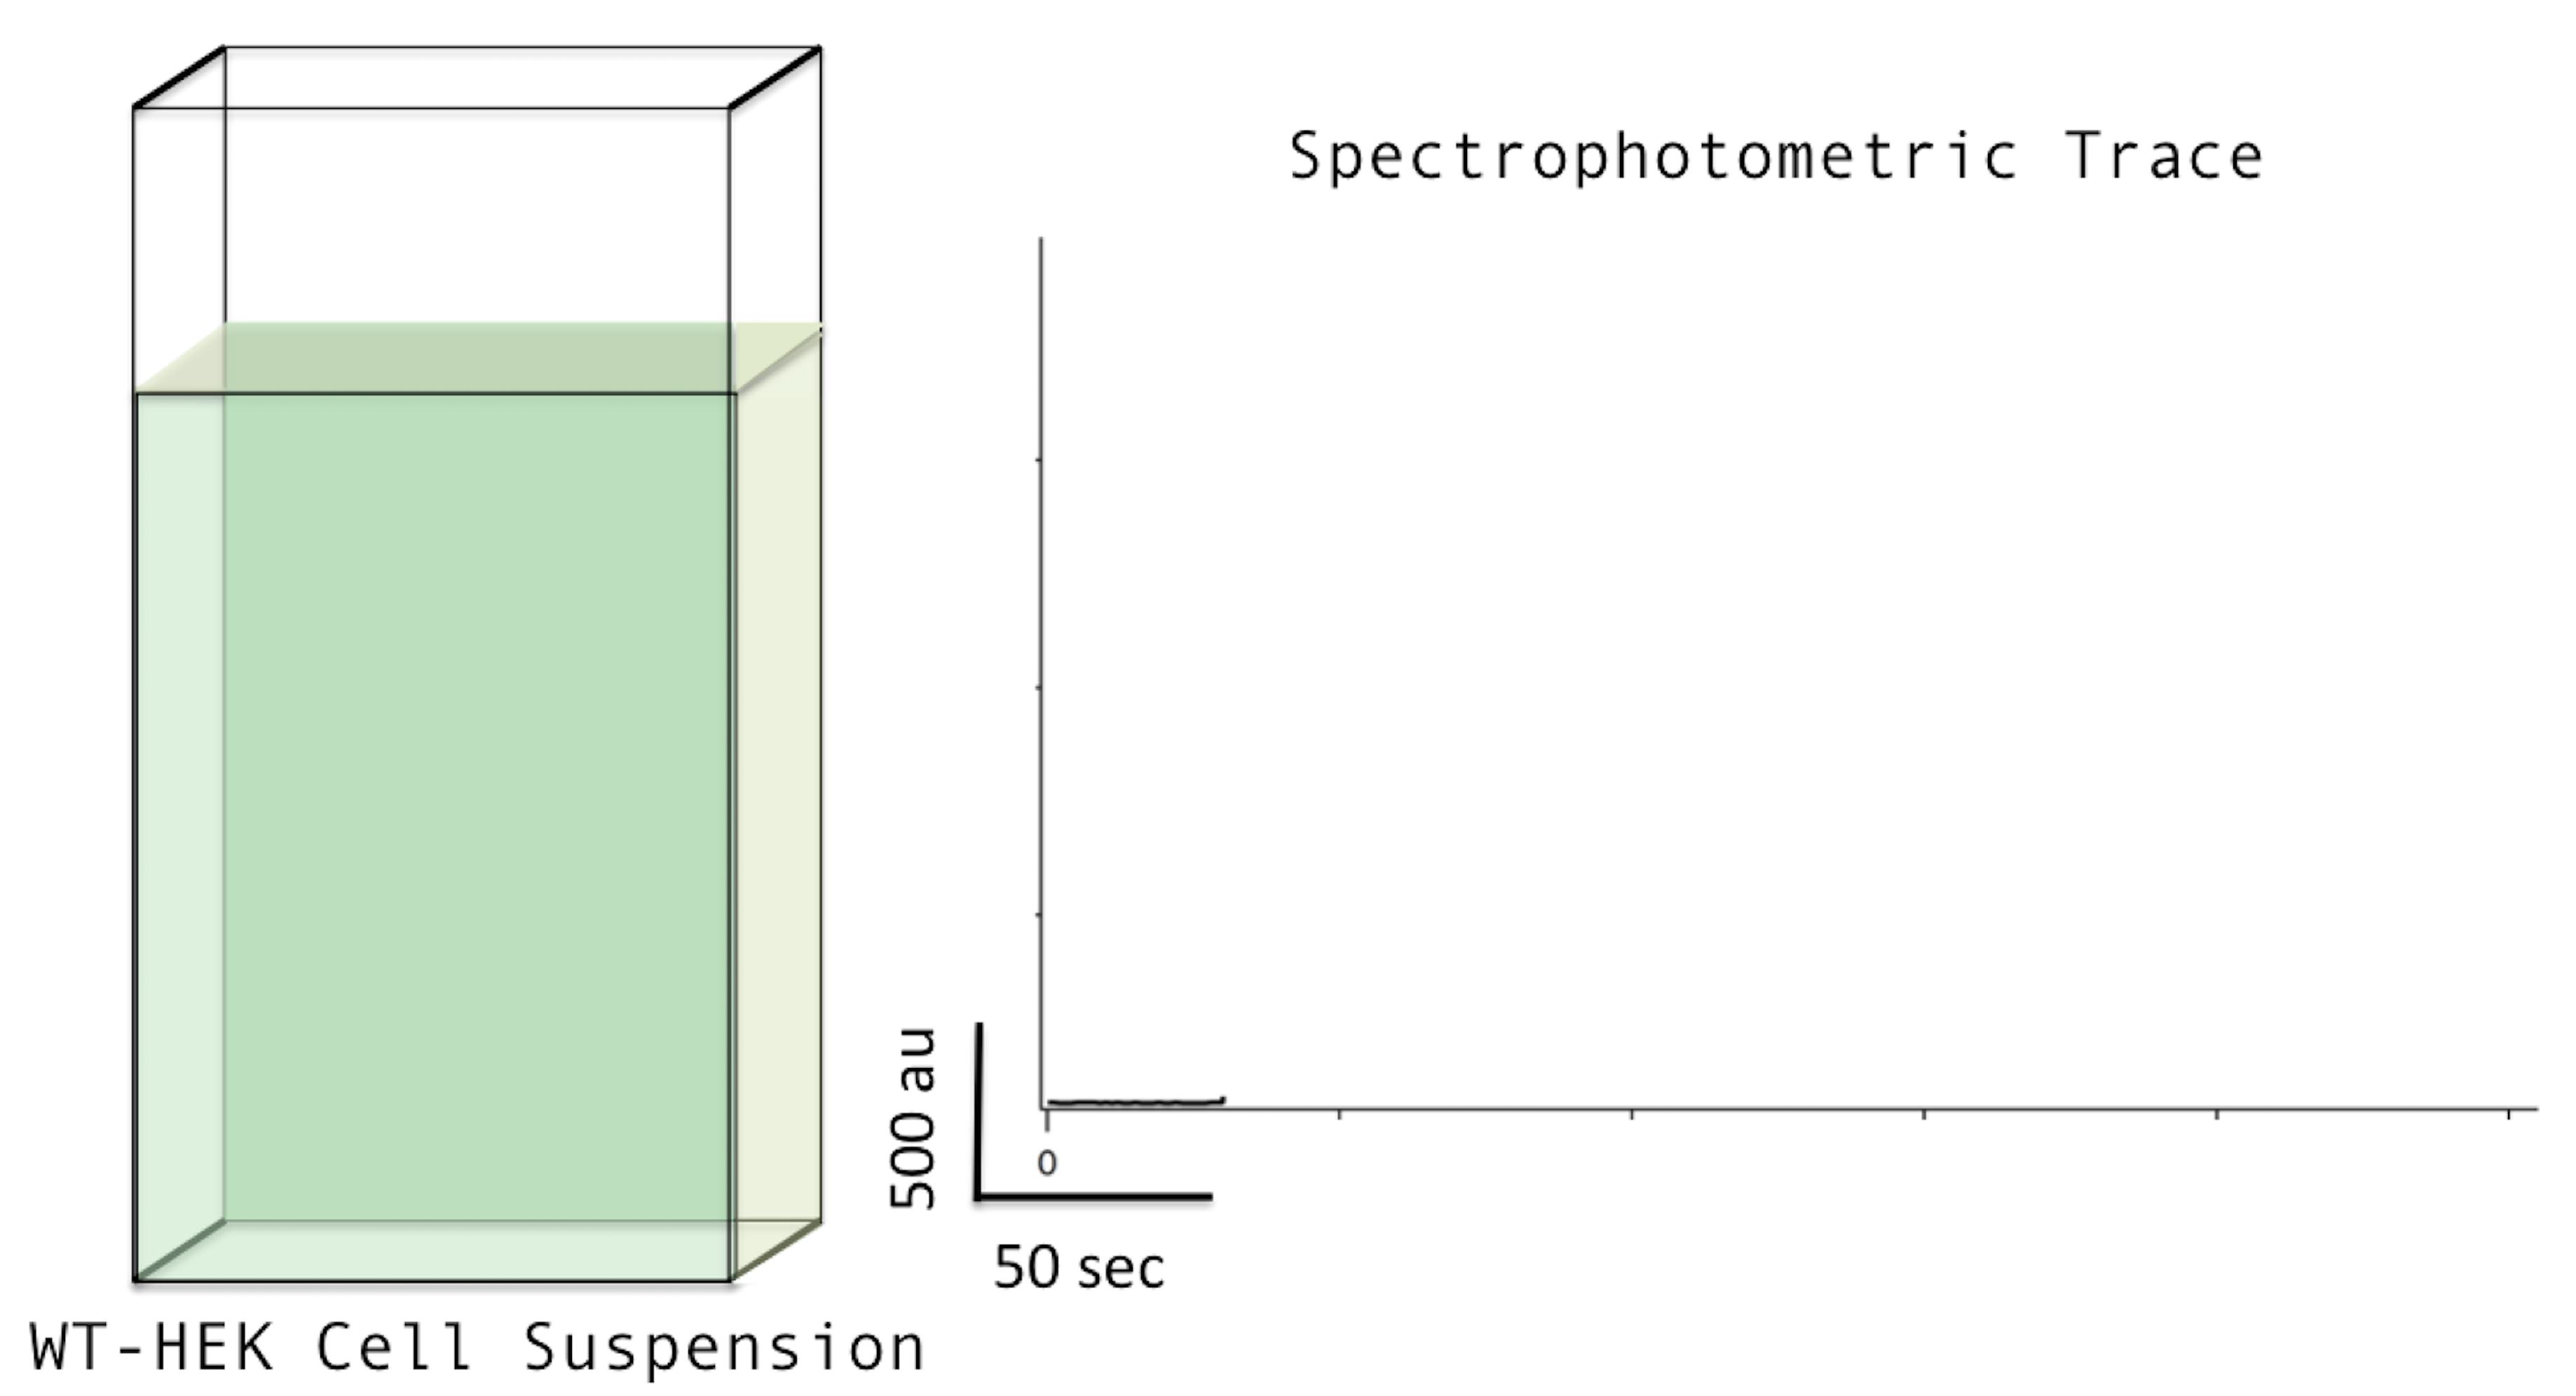 Fluorophore-Based Mitochondrial Ca2+ Uptake Assay